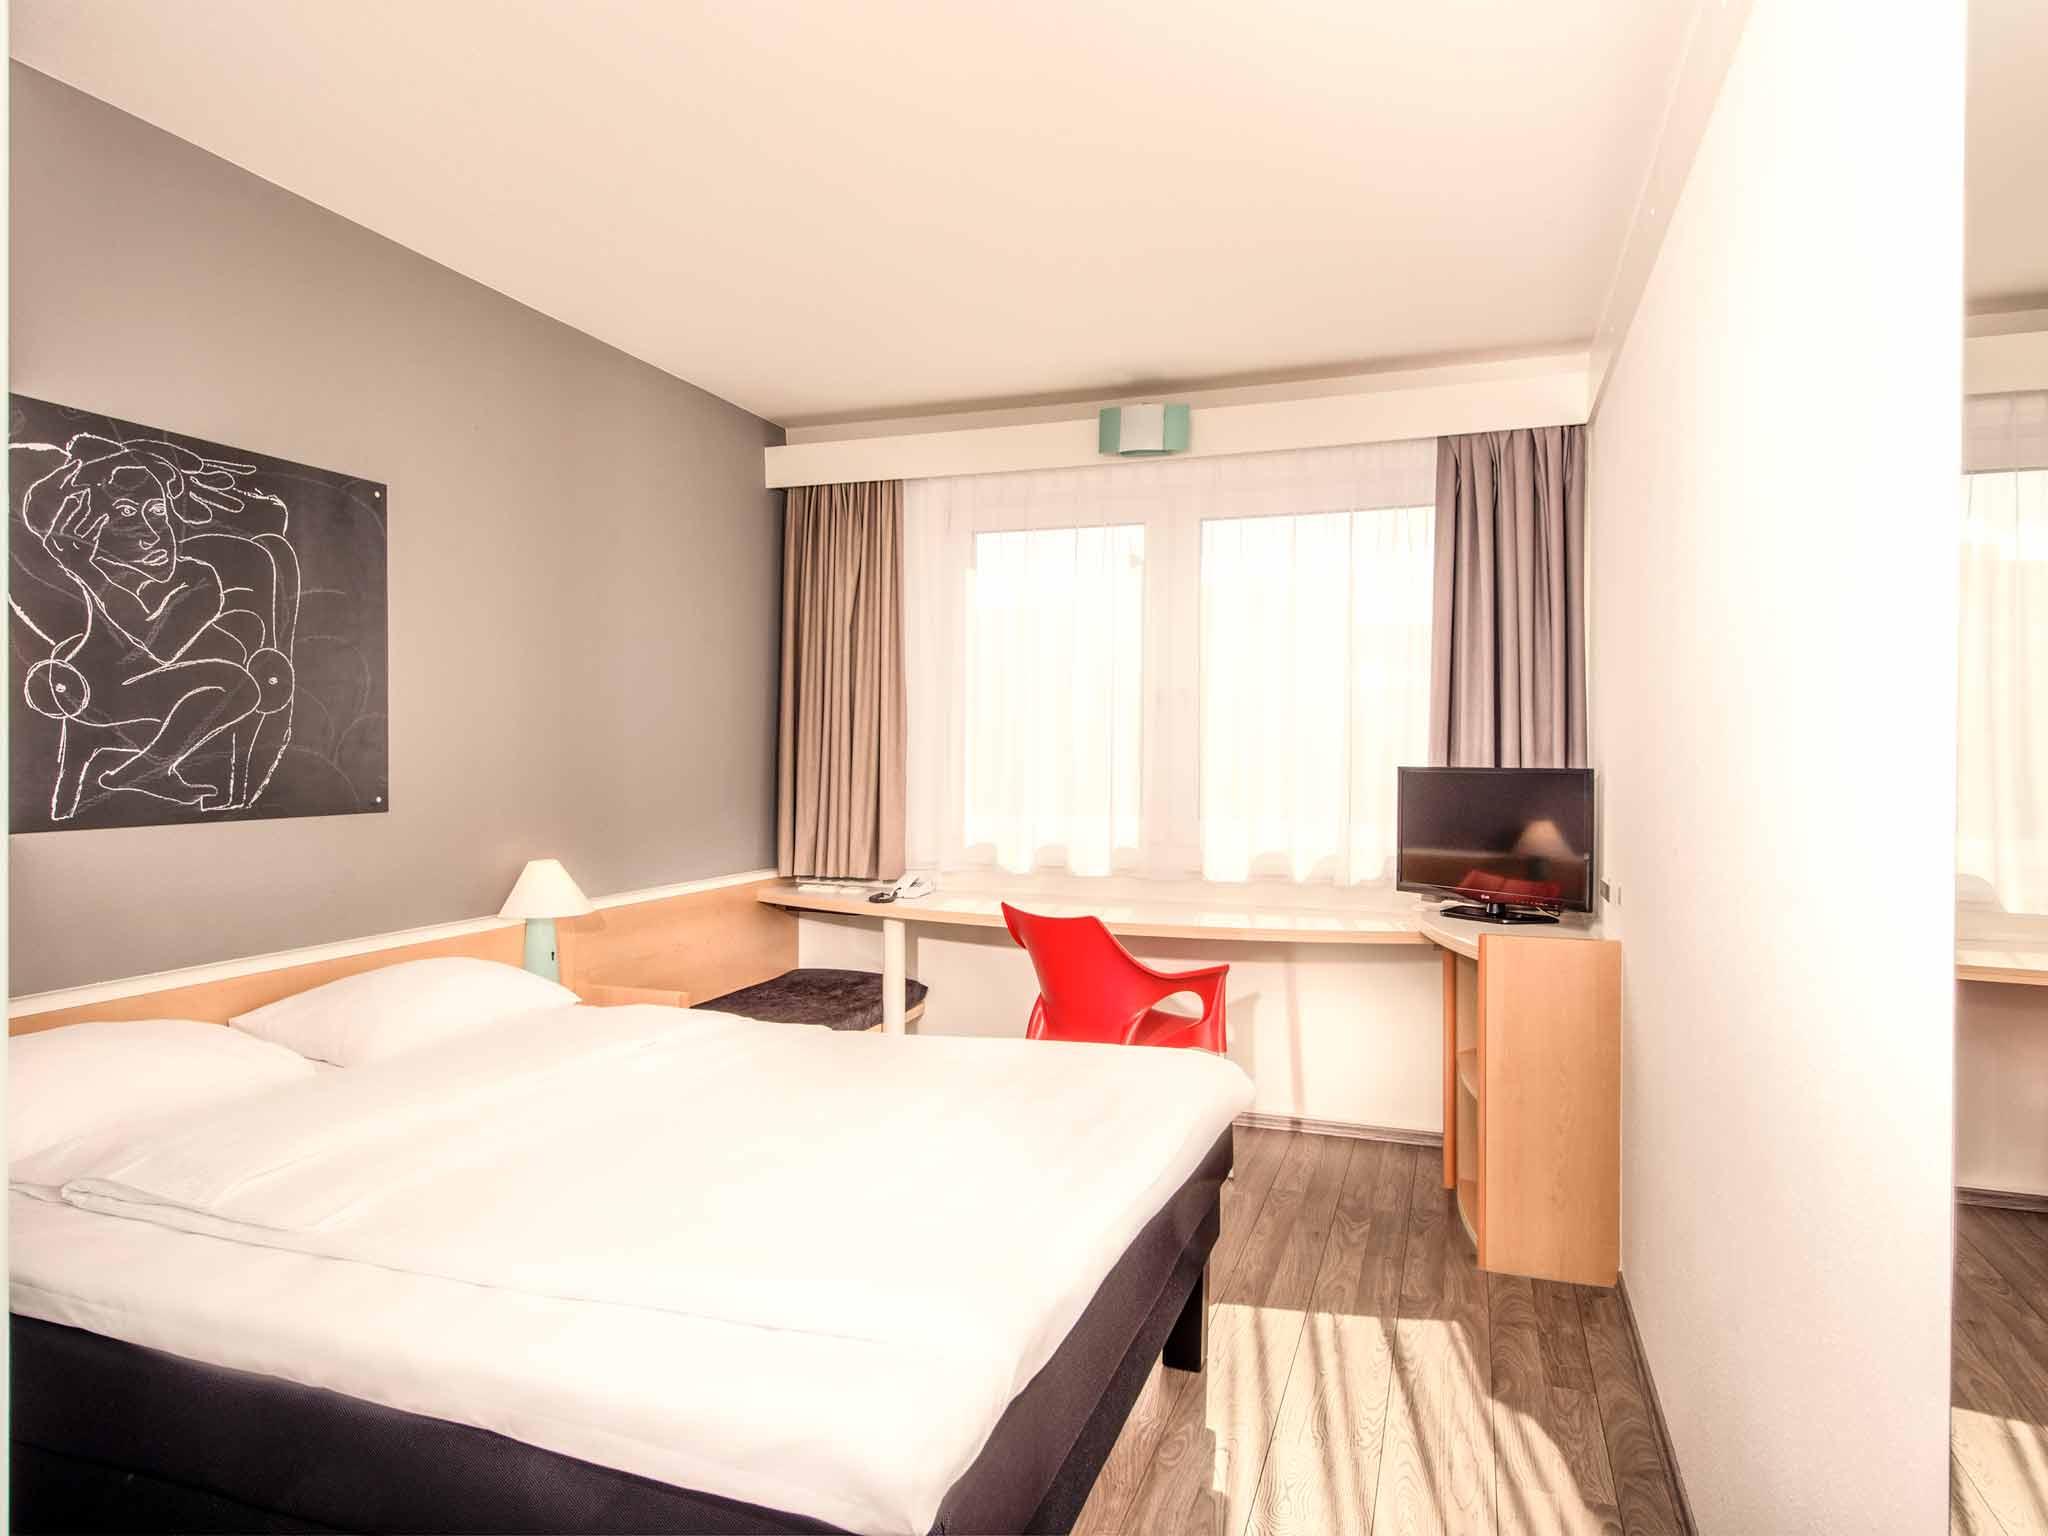 Ibis Hotel Berlin Airport Tegel 客室